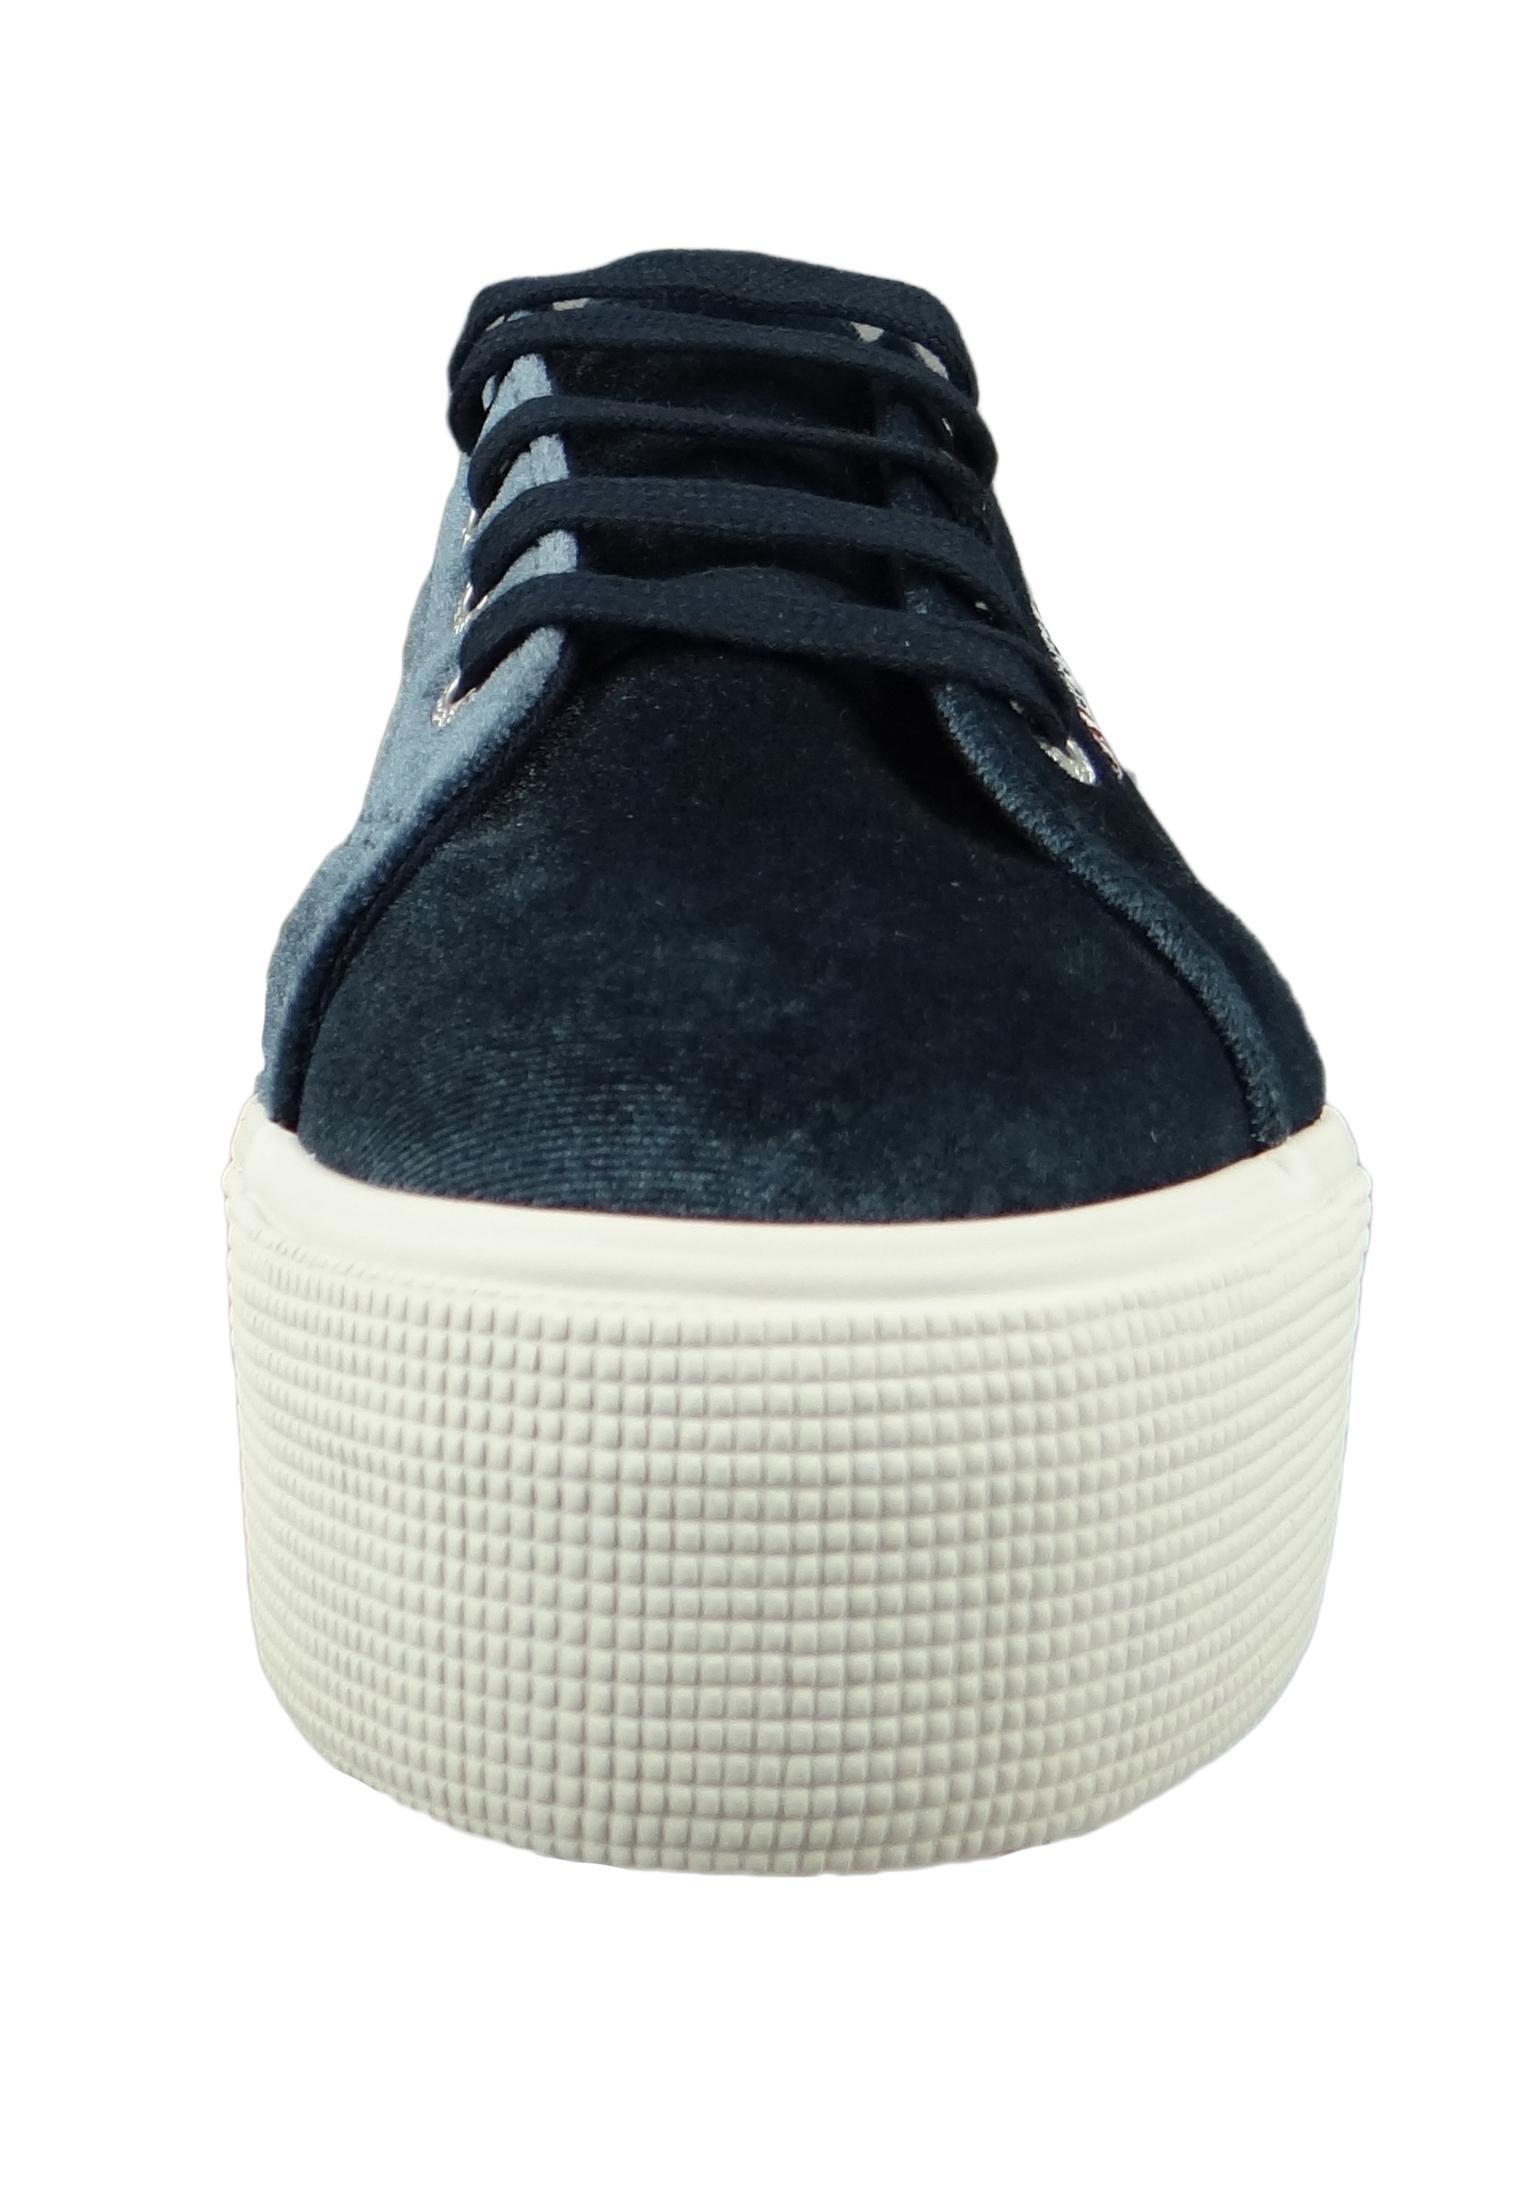 Superga Schuhe Sneaker 2790 Velvetpolyw